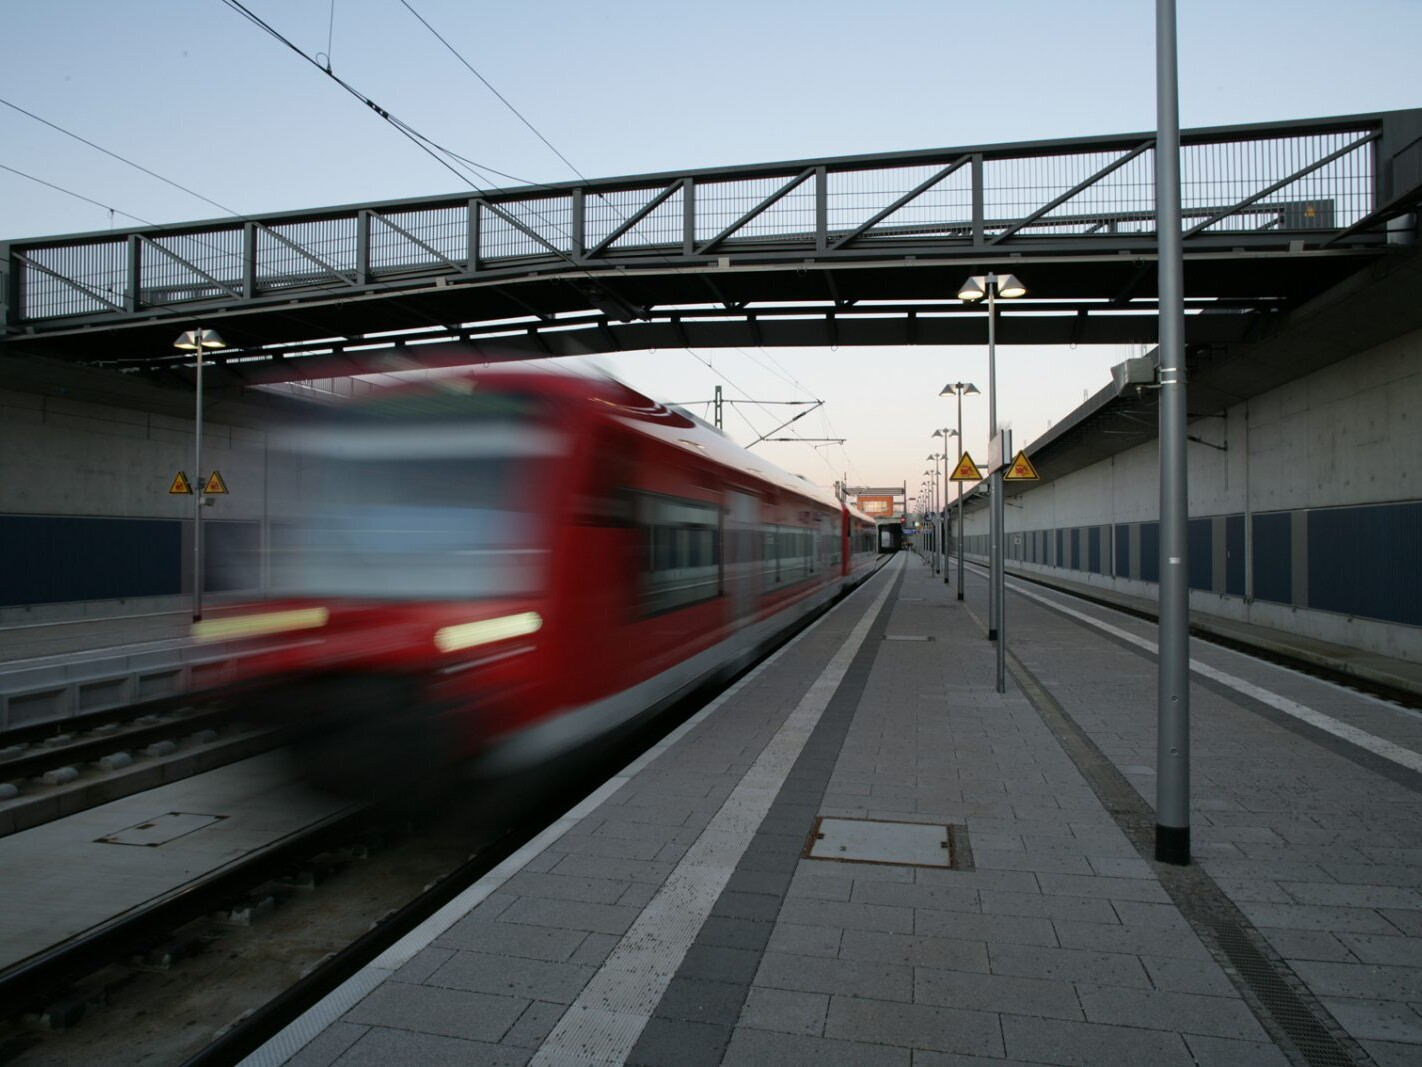 Fuß- und Radwegbrücke über ICE-Bahnhof, Neu-Ulm